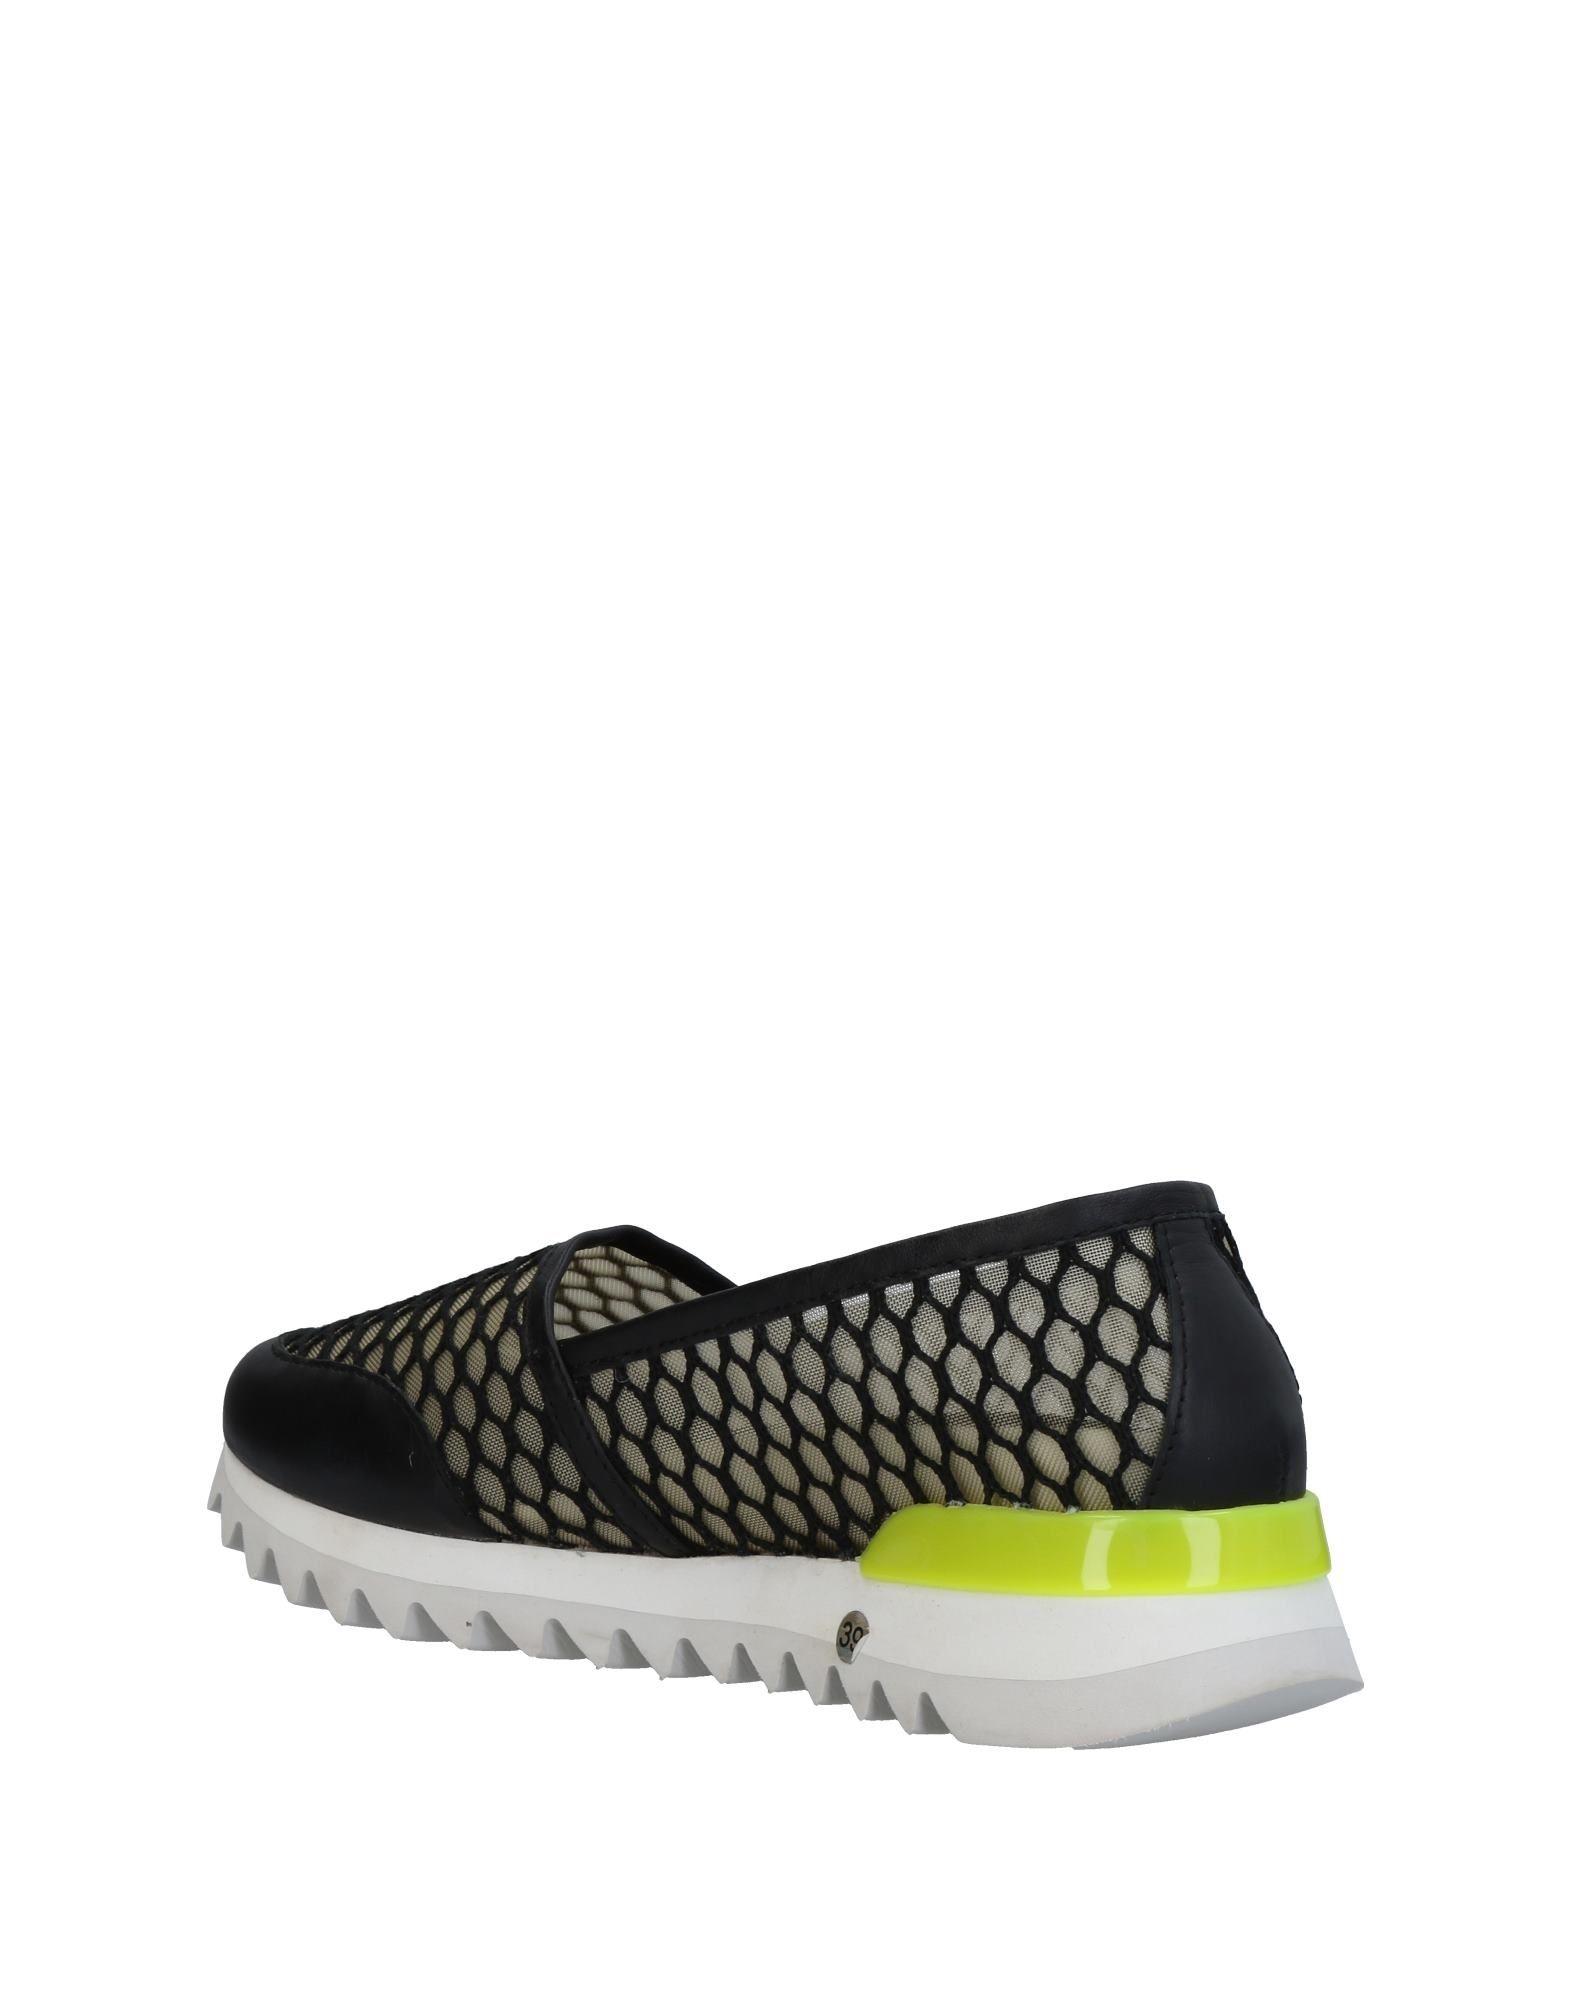 Gut Gut Gut um billige Schuhe zu tragenMy Grey Sneakers Damen  11437355LU 8bd63c